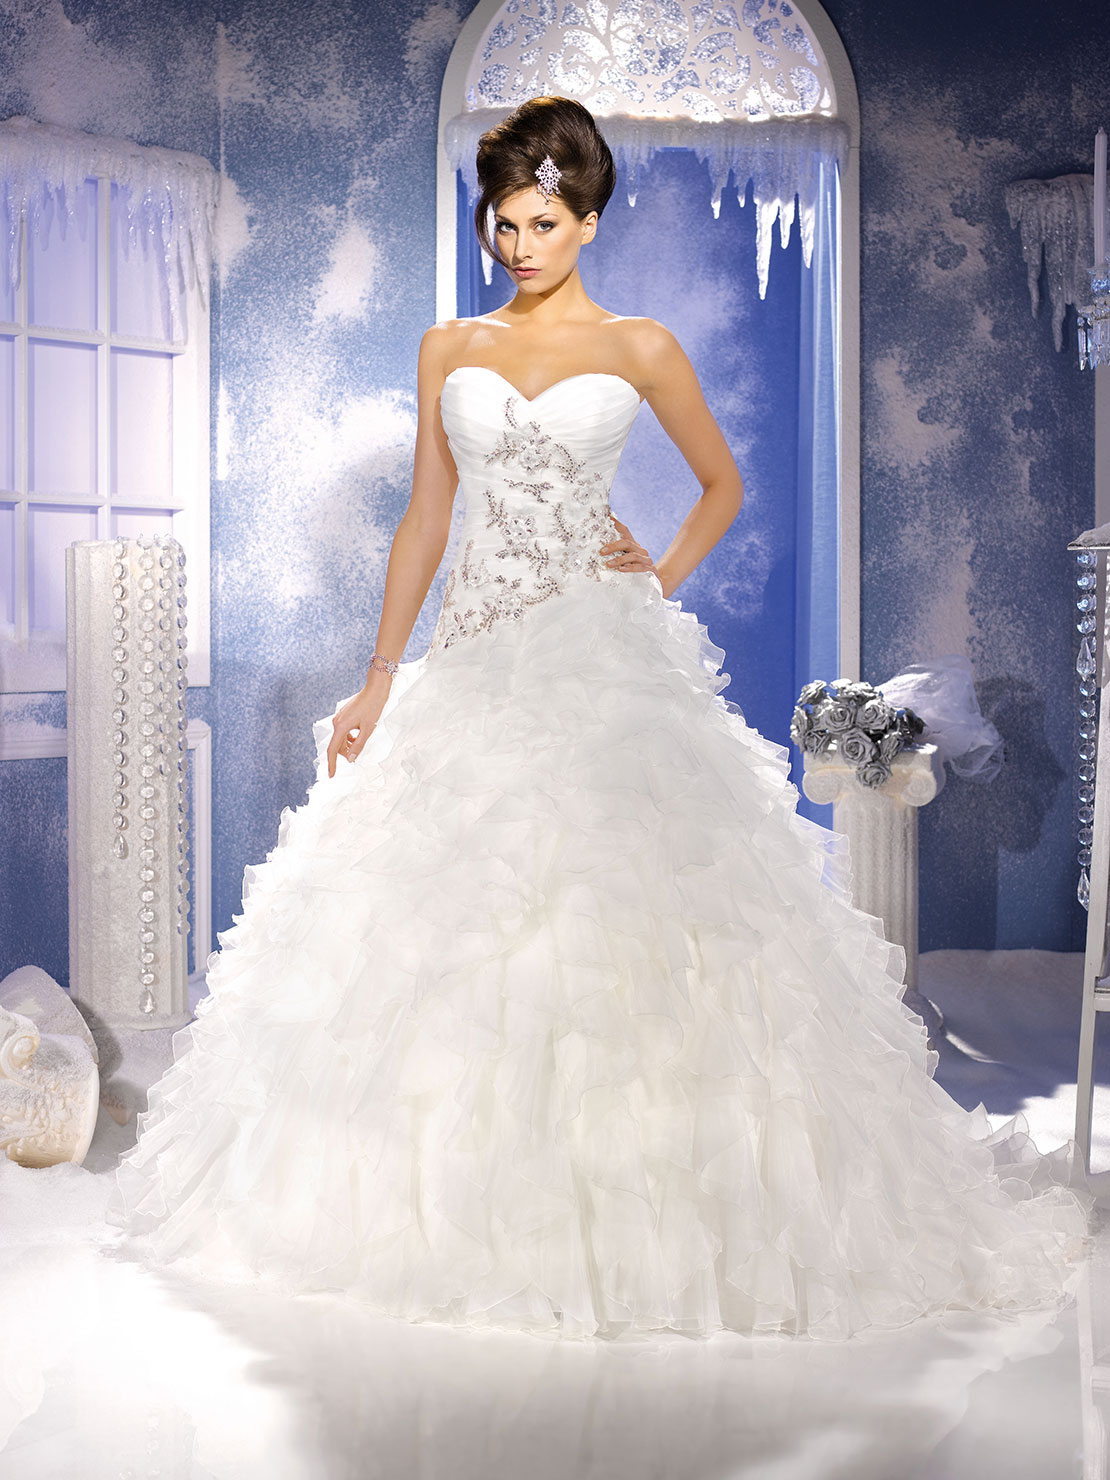 Kelly Star Wedding Dress Collection 2015 - Star Wedding Dress